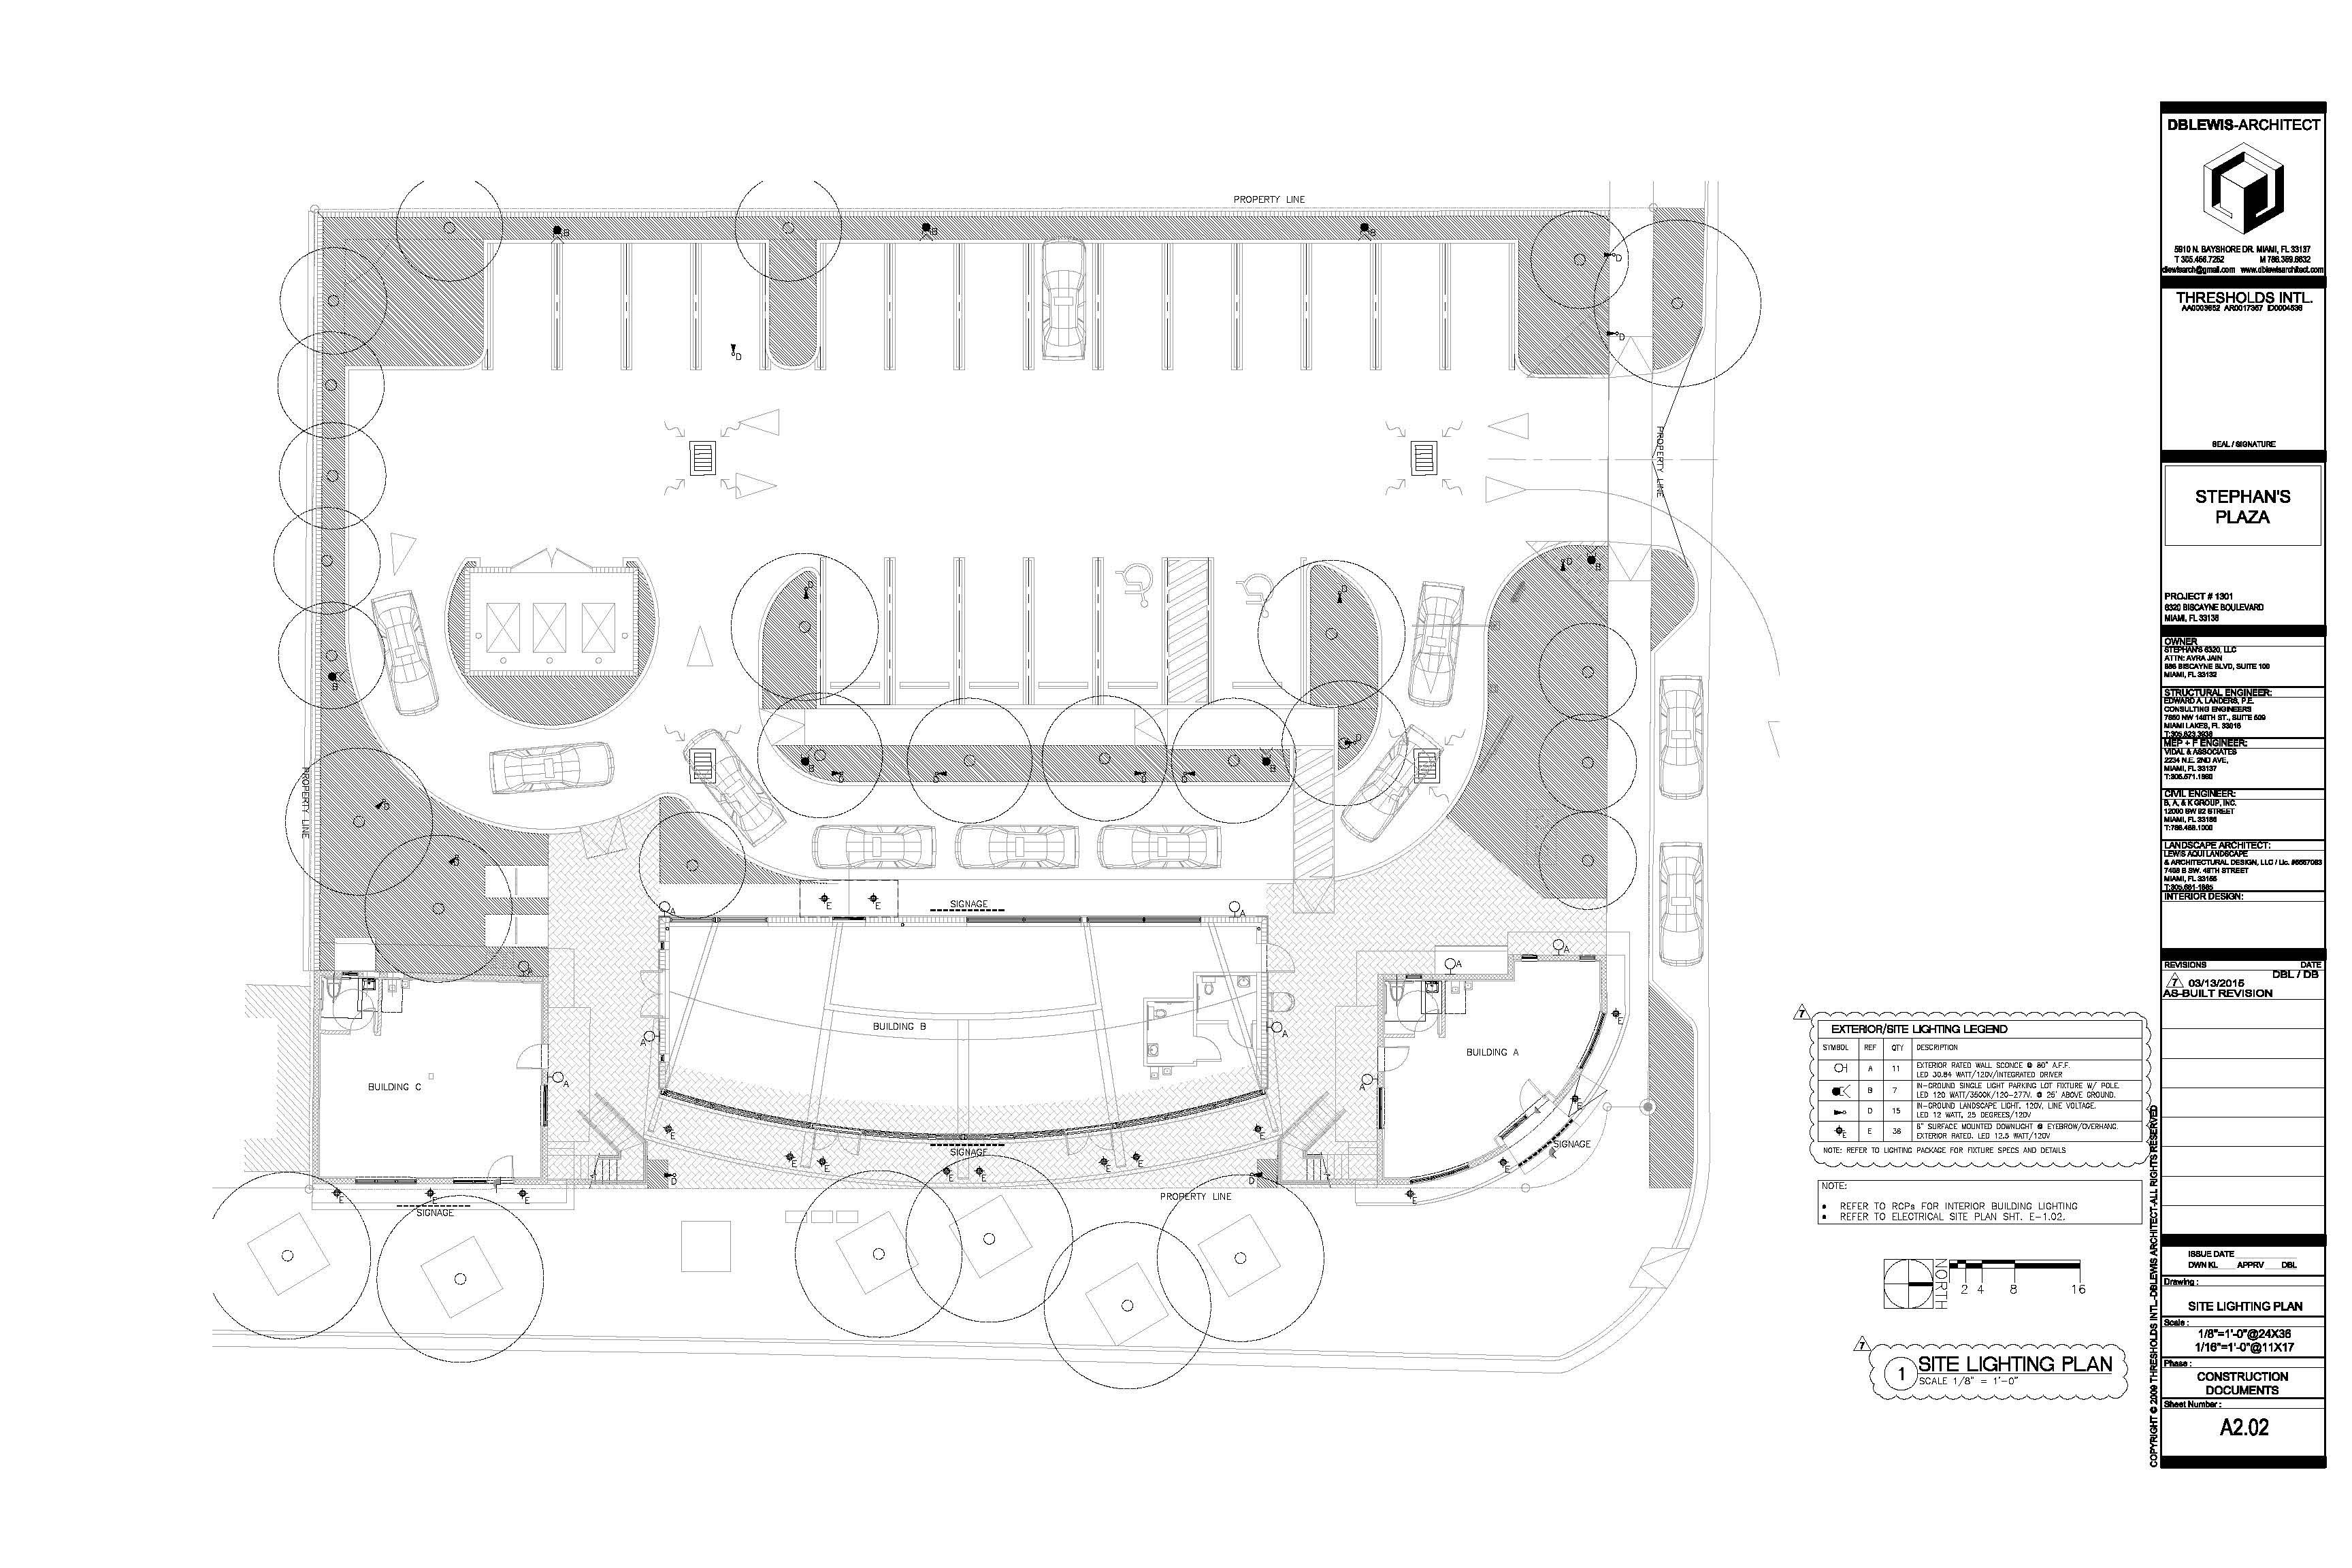 Site lighting plan